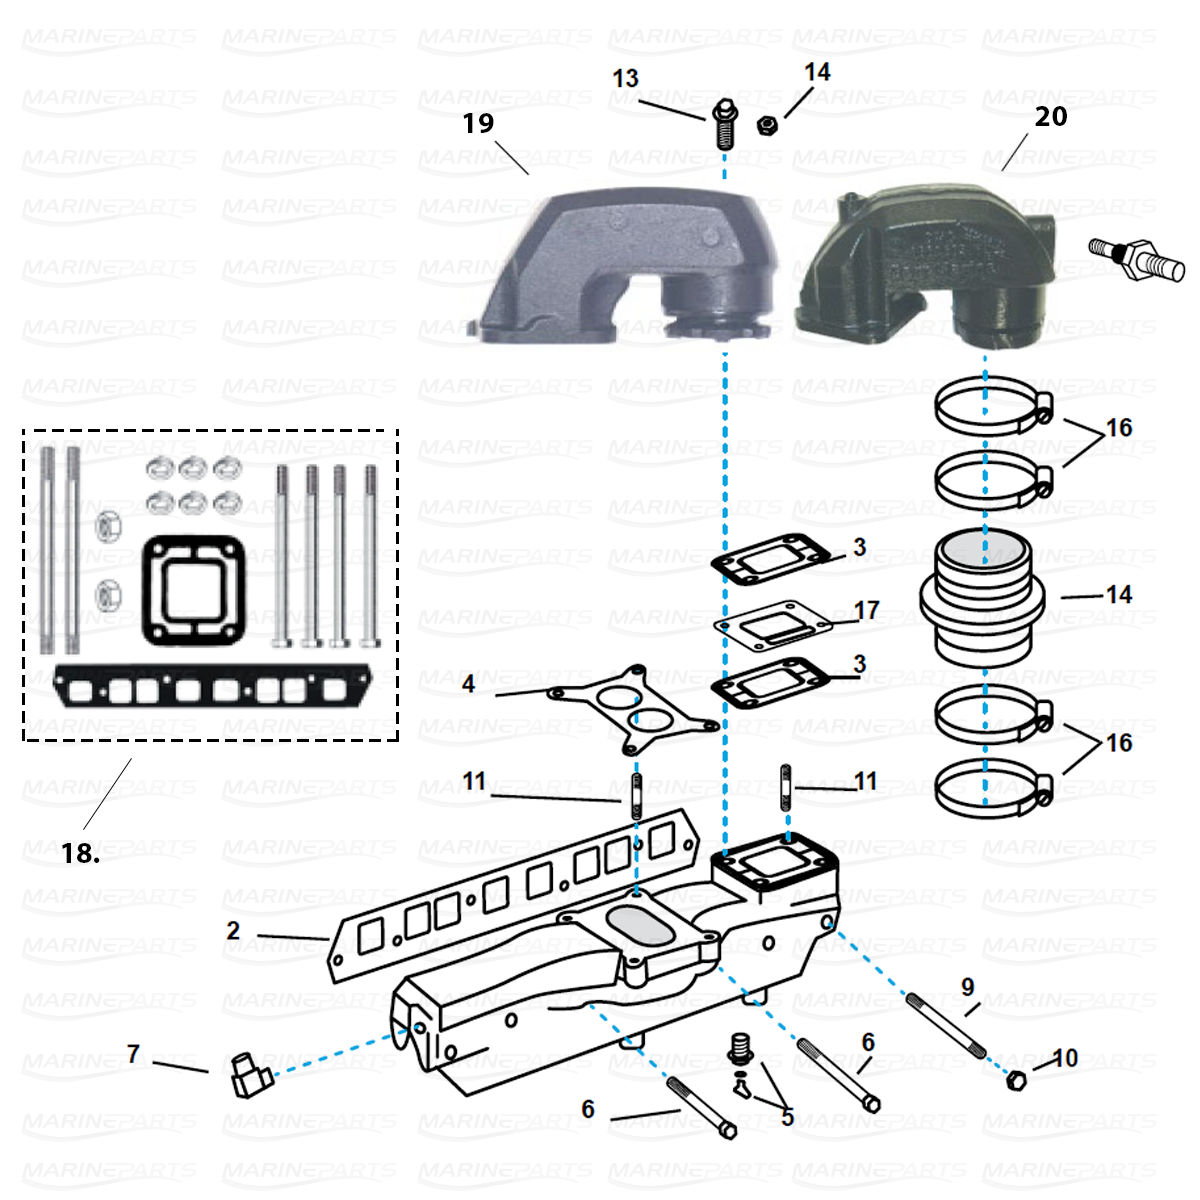 Pakosarjan osia Volvo Pentoihin 4 cyl. 3.0 ltr. GM lohko